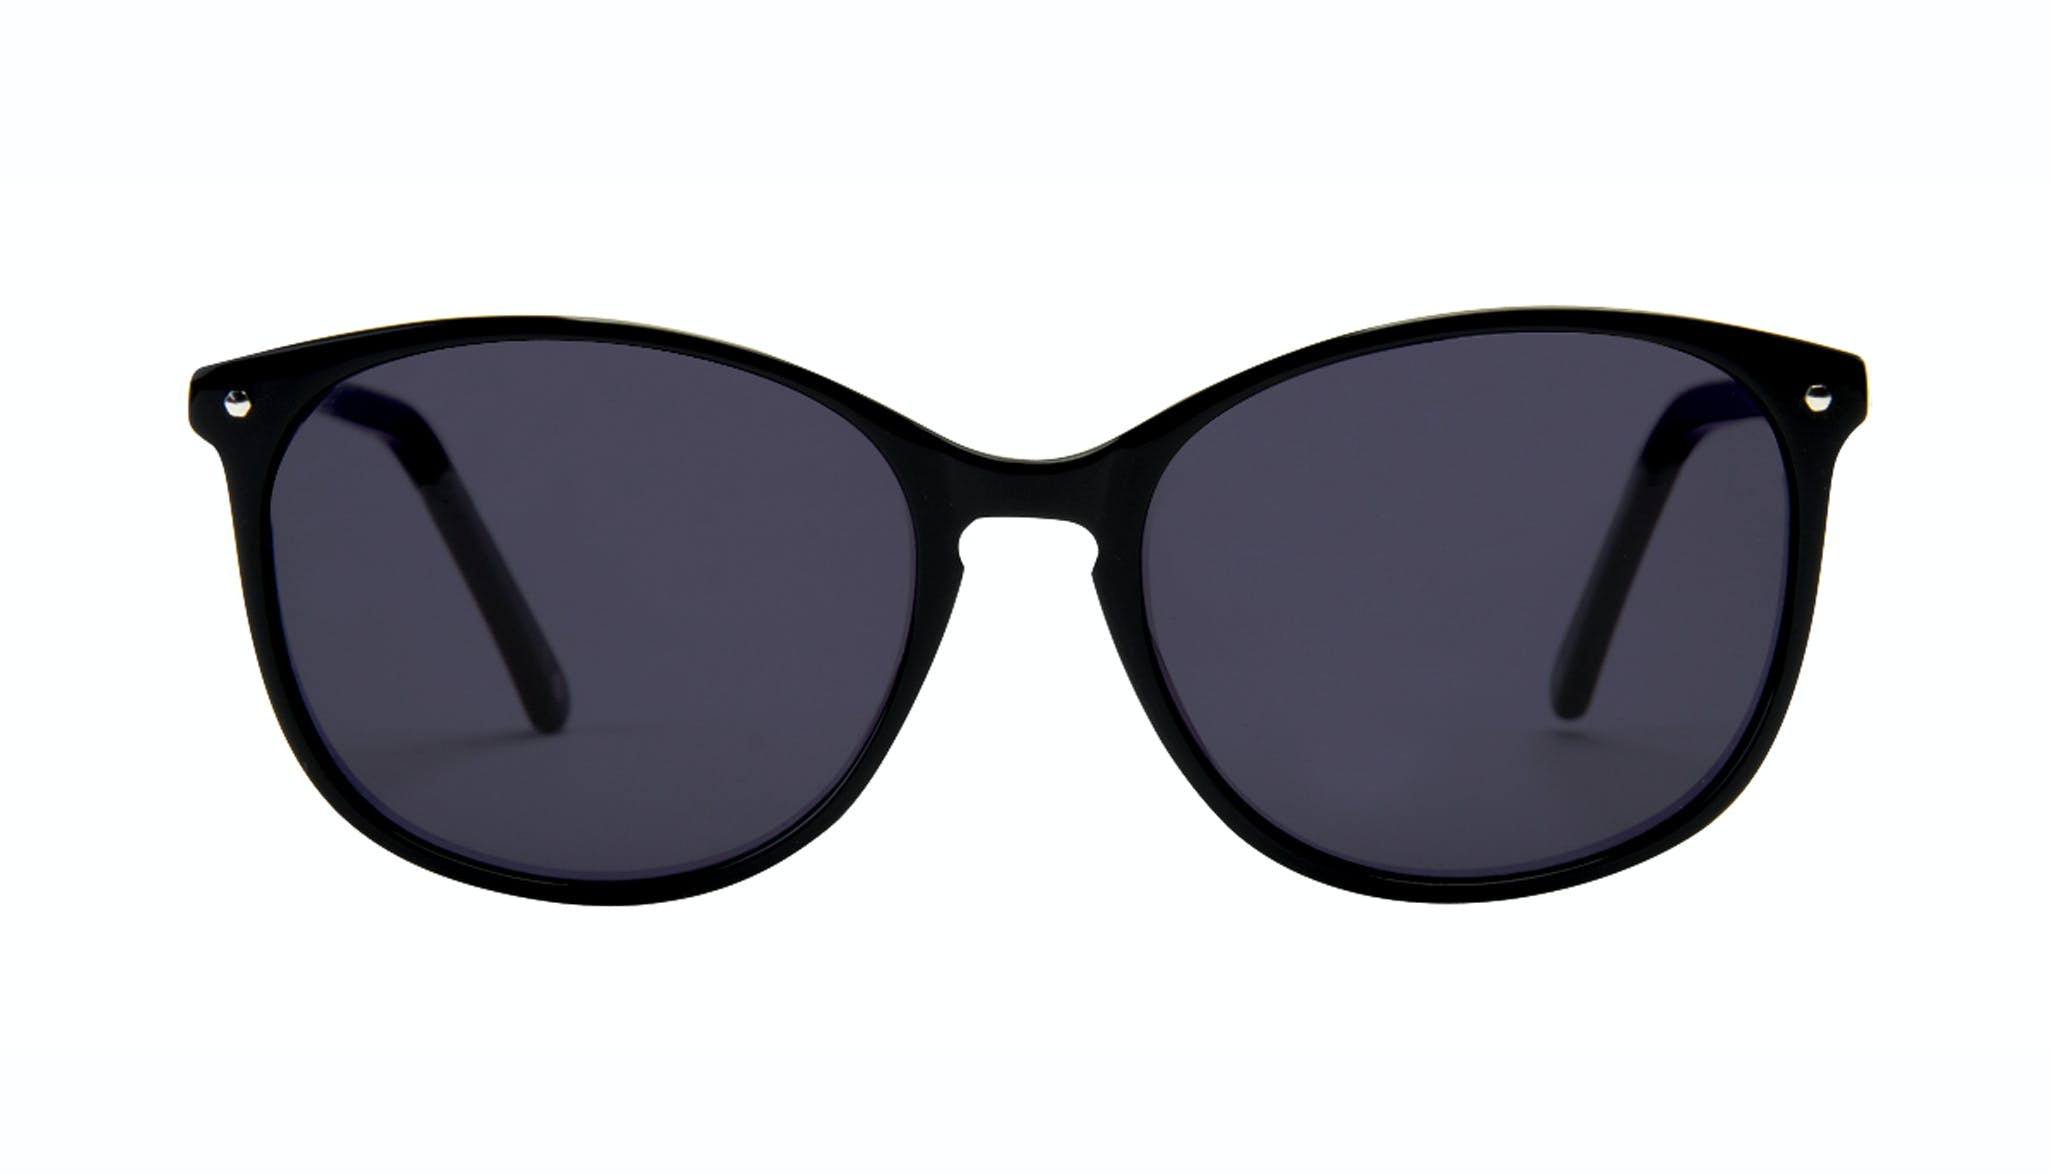 Affordable Fashion Glasses Rectangle Square Round Sunglasses Women Nadine Pitch Black